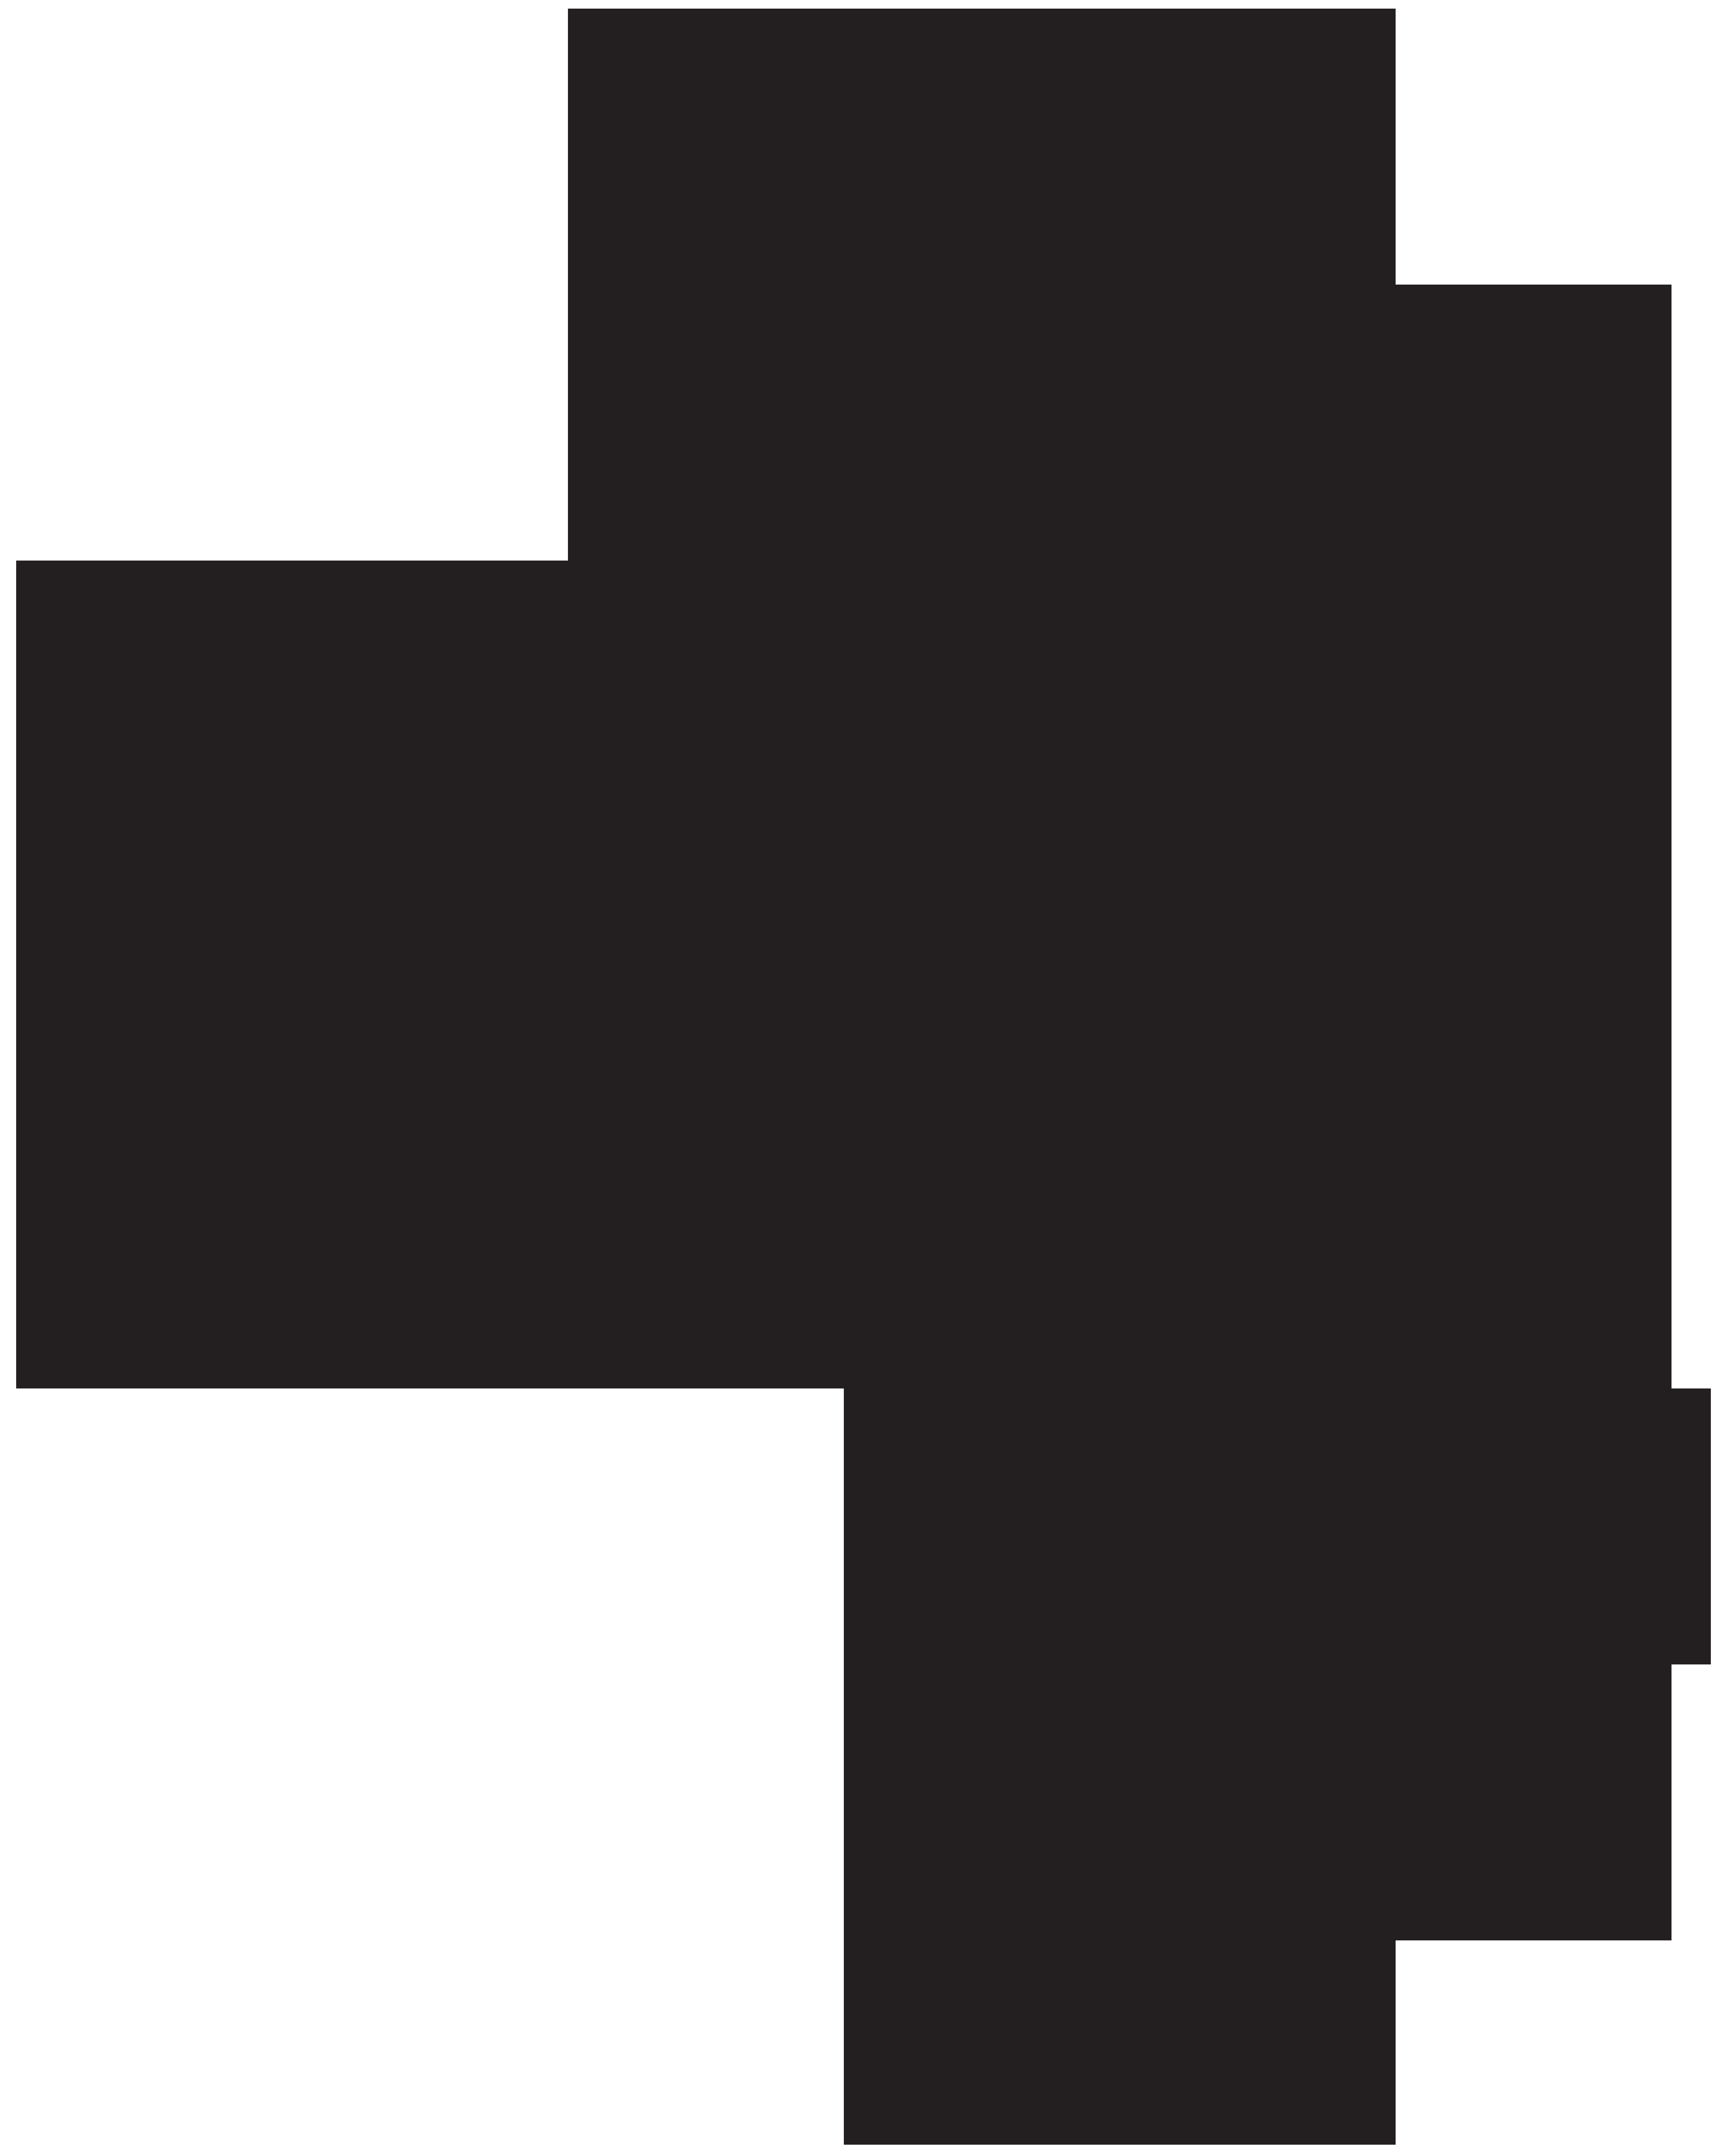 Clipart sports tennis, Clipart sports tennis Transparent ...